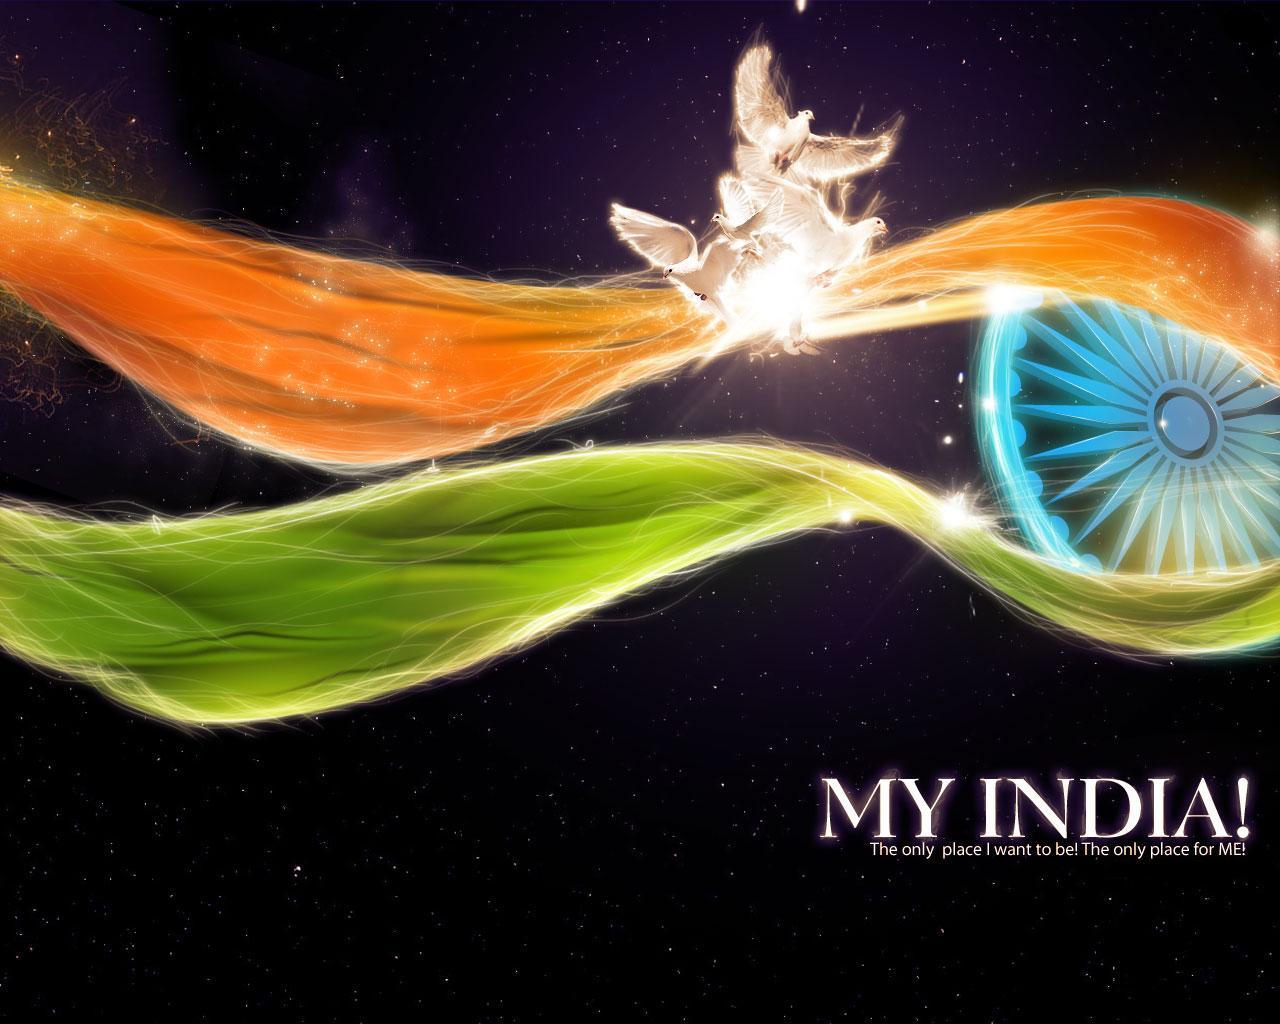 indian flag flying wallpaper | wide screen wallpaper 1080p,2k,4k